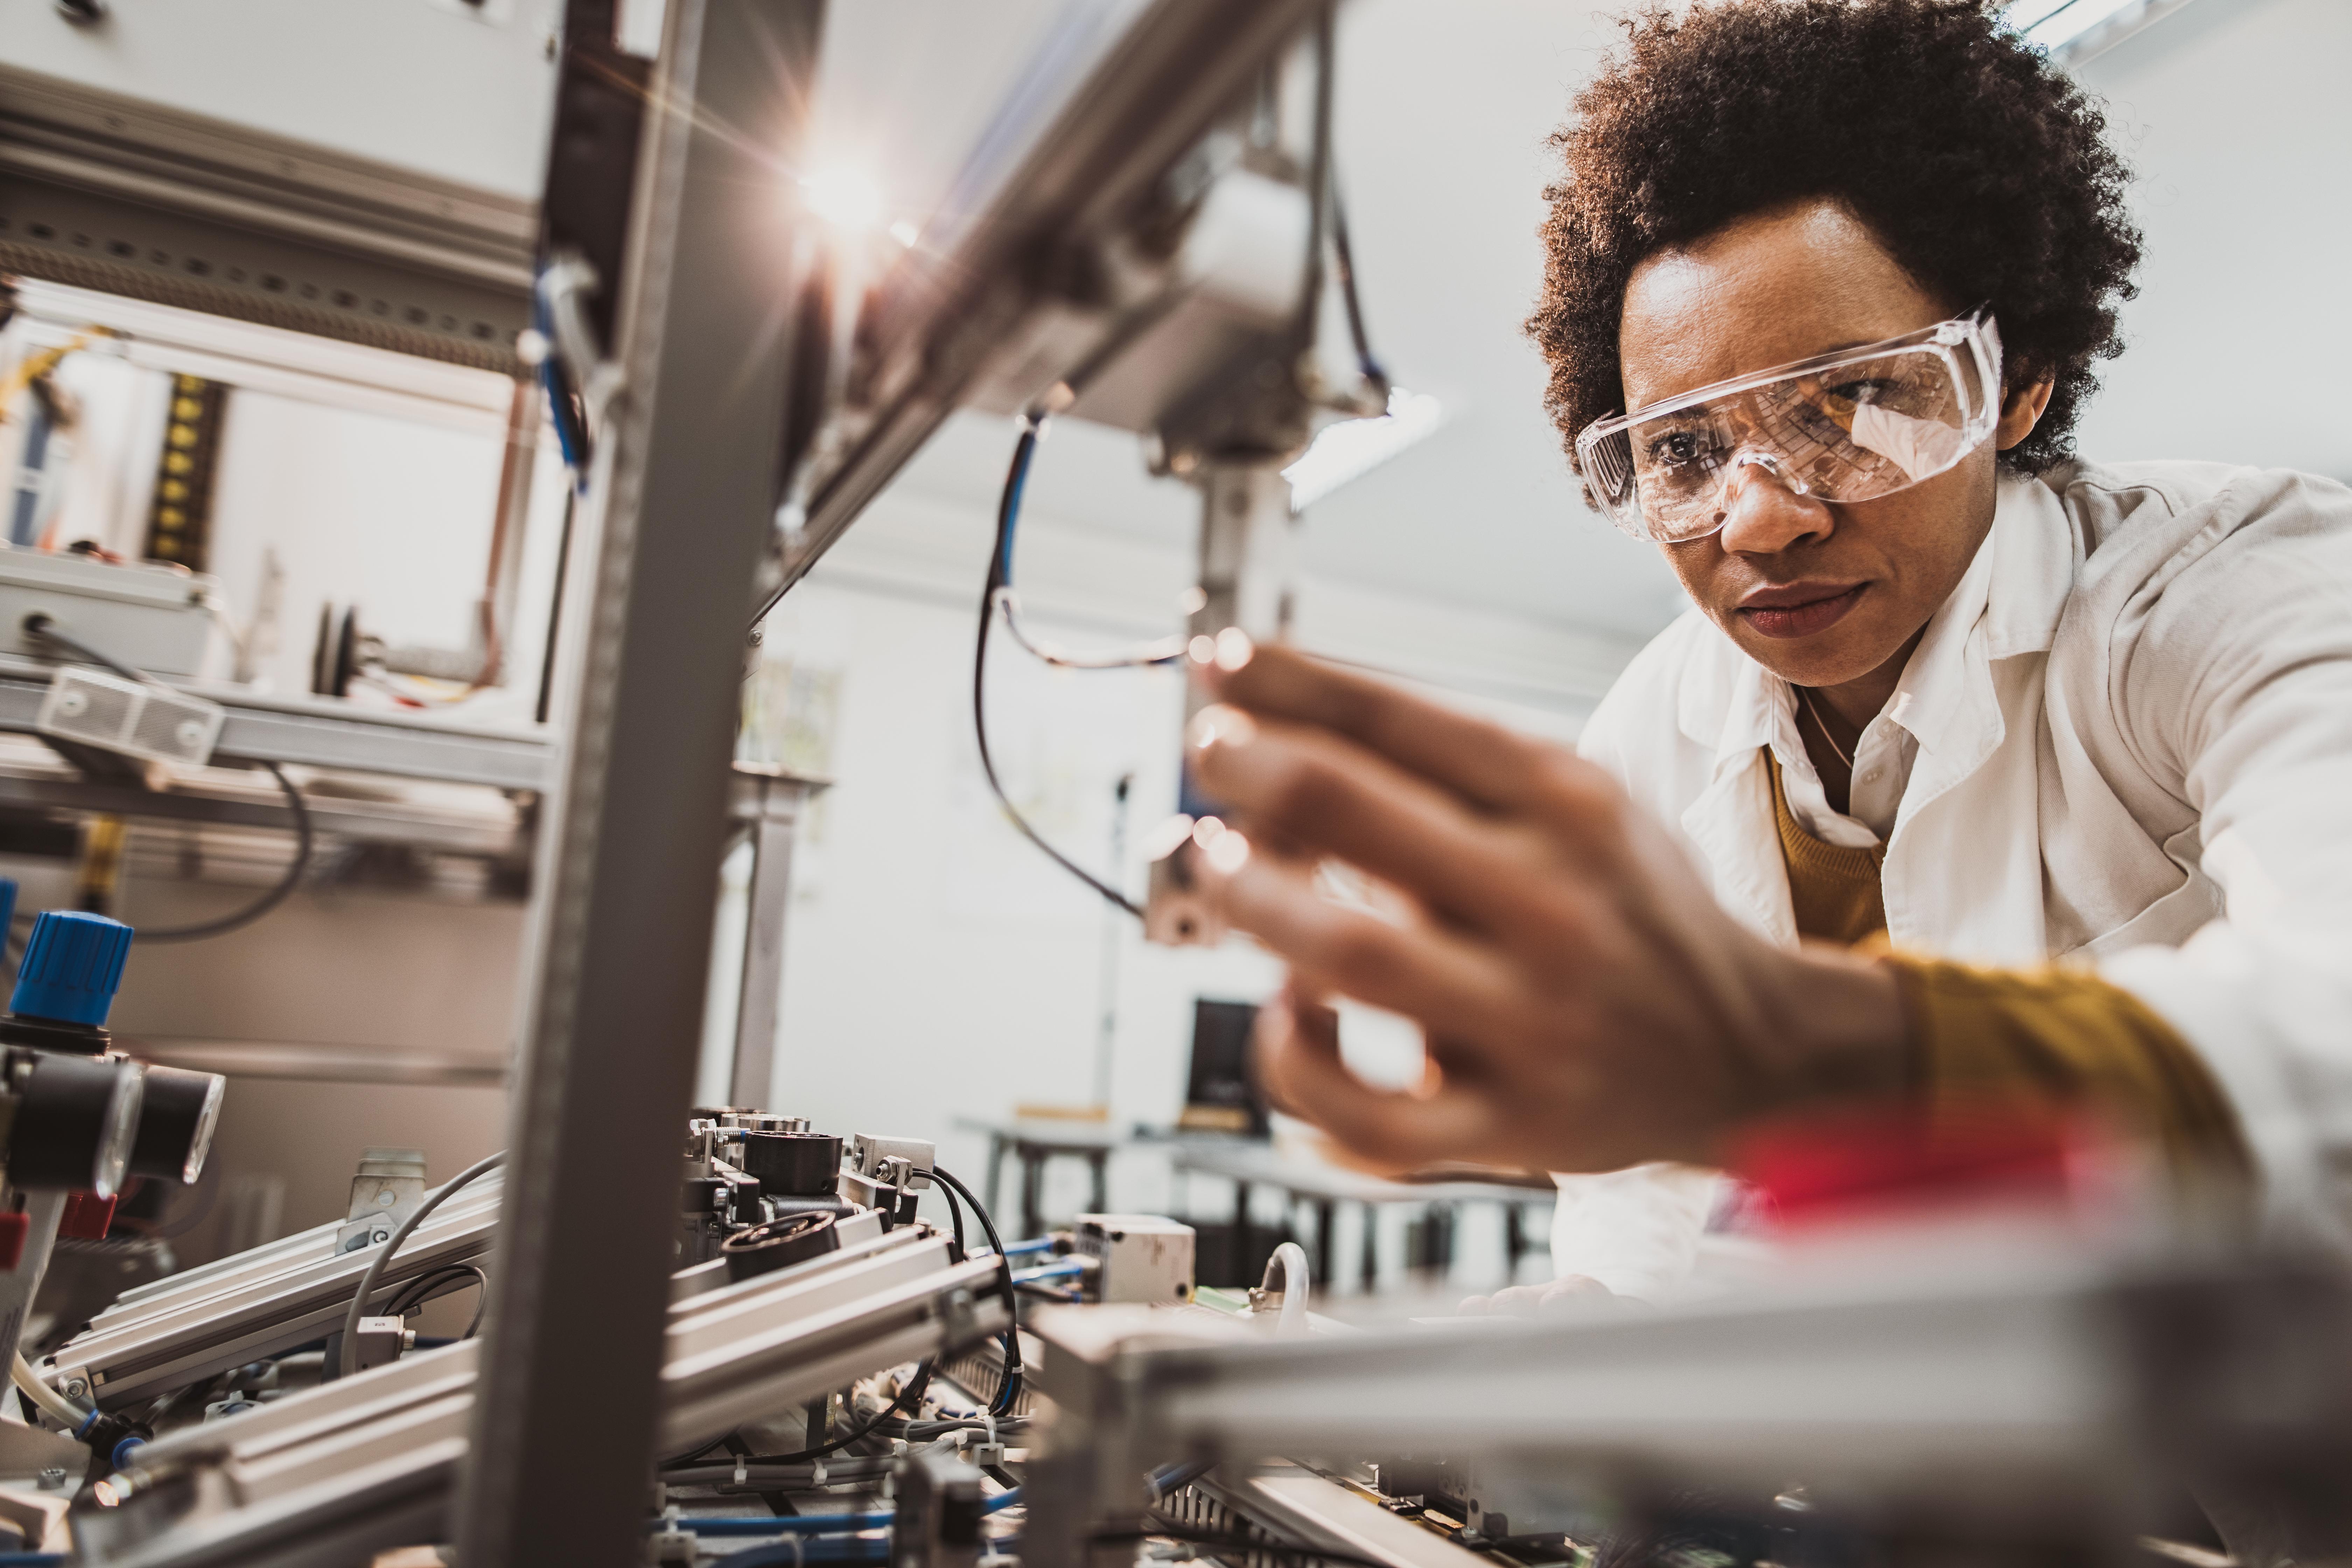 Black female engineer working on industrial machine in a laboratory.